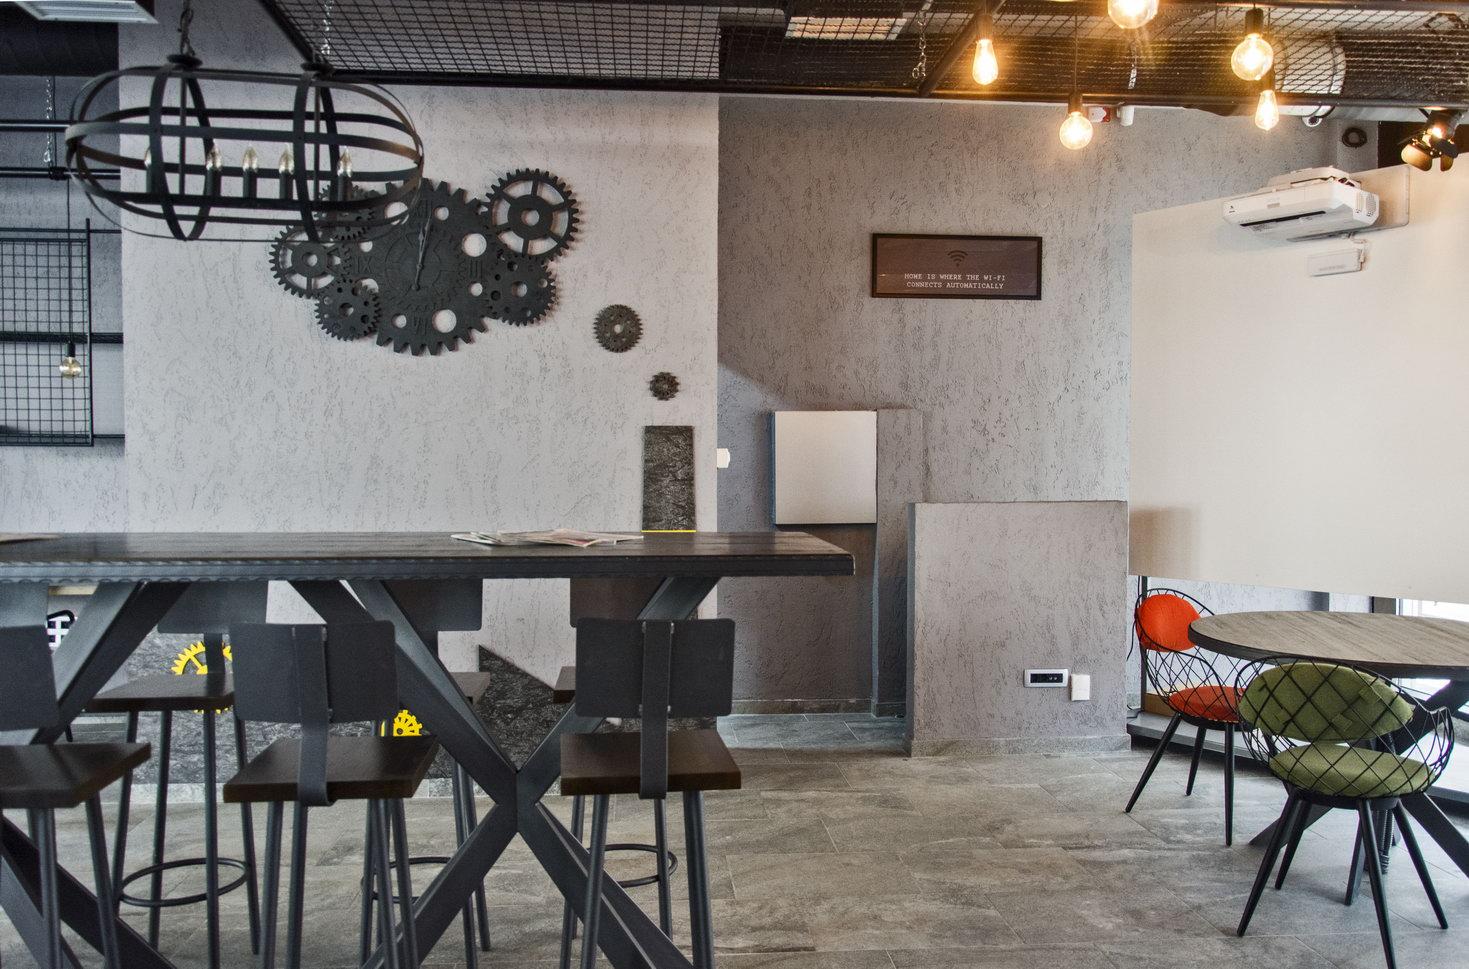 Mtel digitalna fabrika, Podgorica